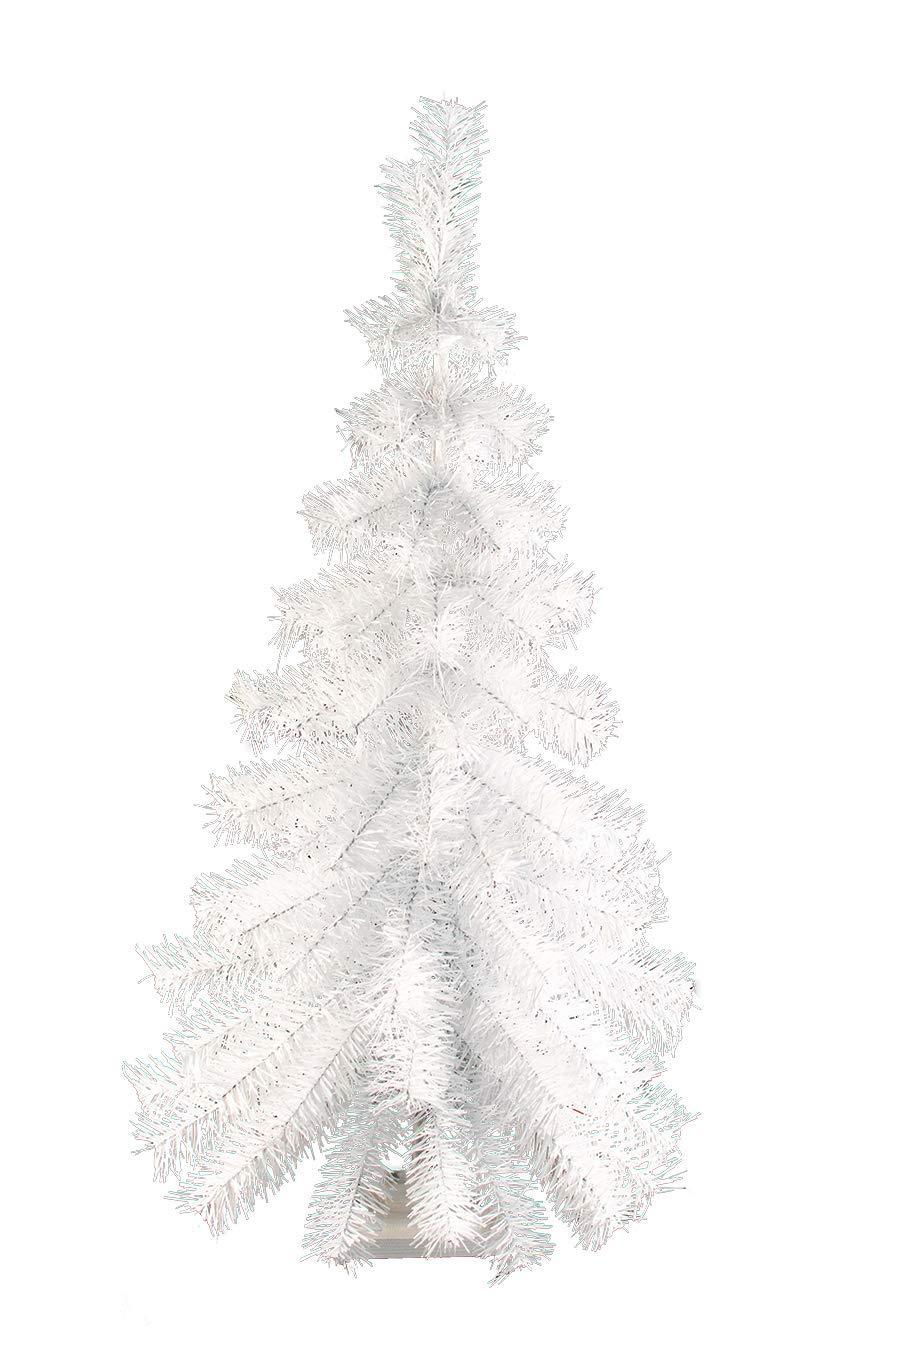 3FT White Hanging Wall Christmas Tree Classic White Tinsel Tree Half Cut Wall Decor 36'' White Feather Tree Vintage Retro Christmas Merchandising Retail Display Tree